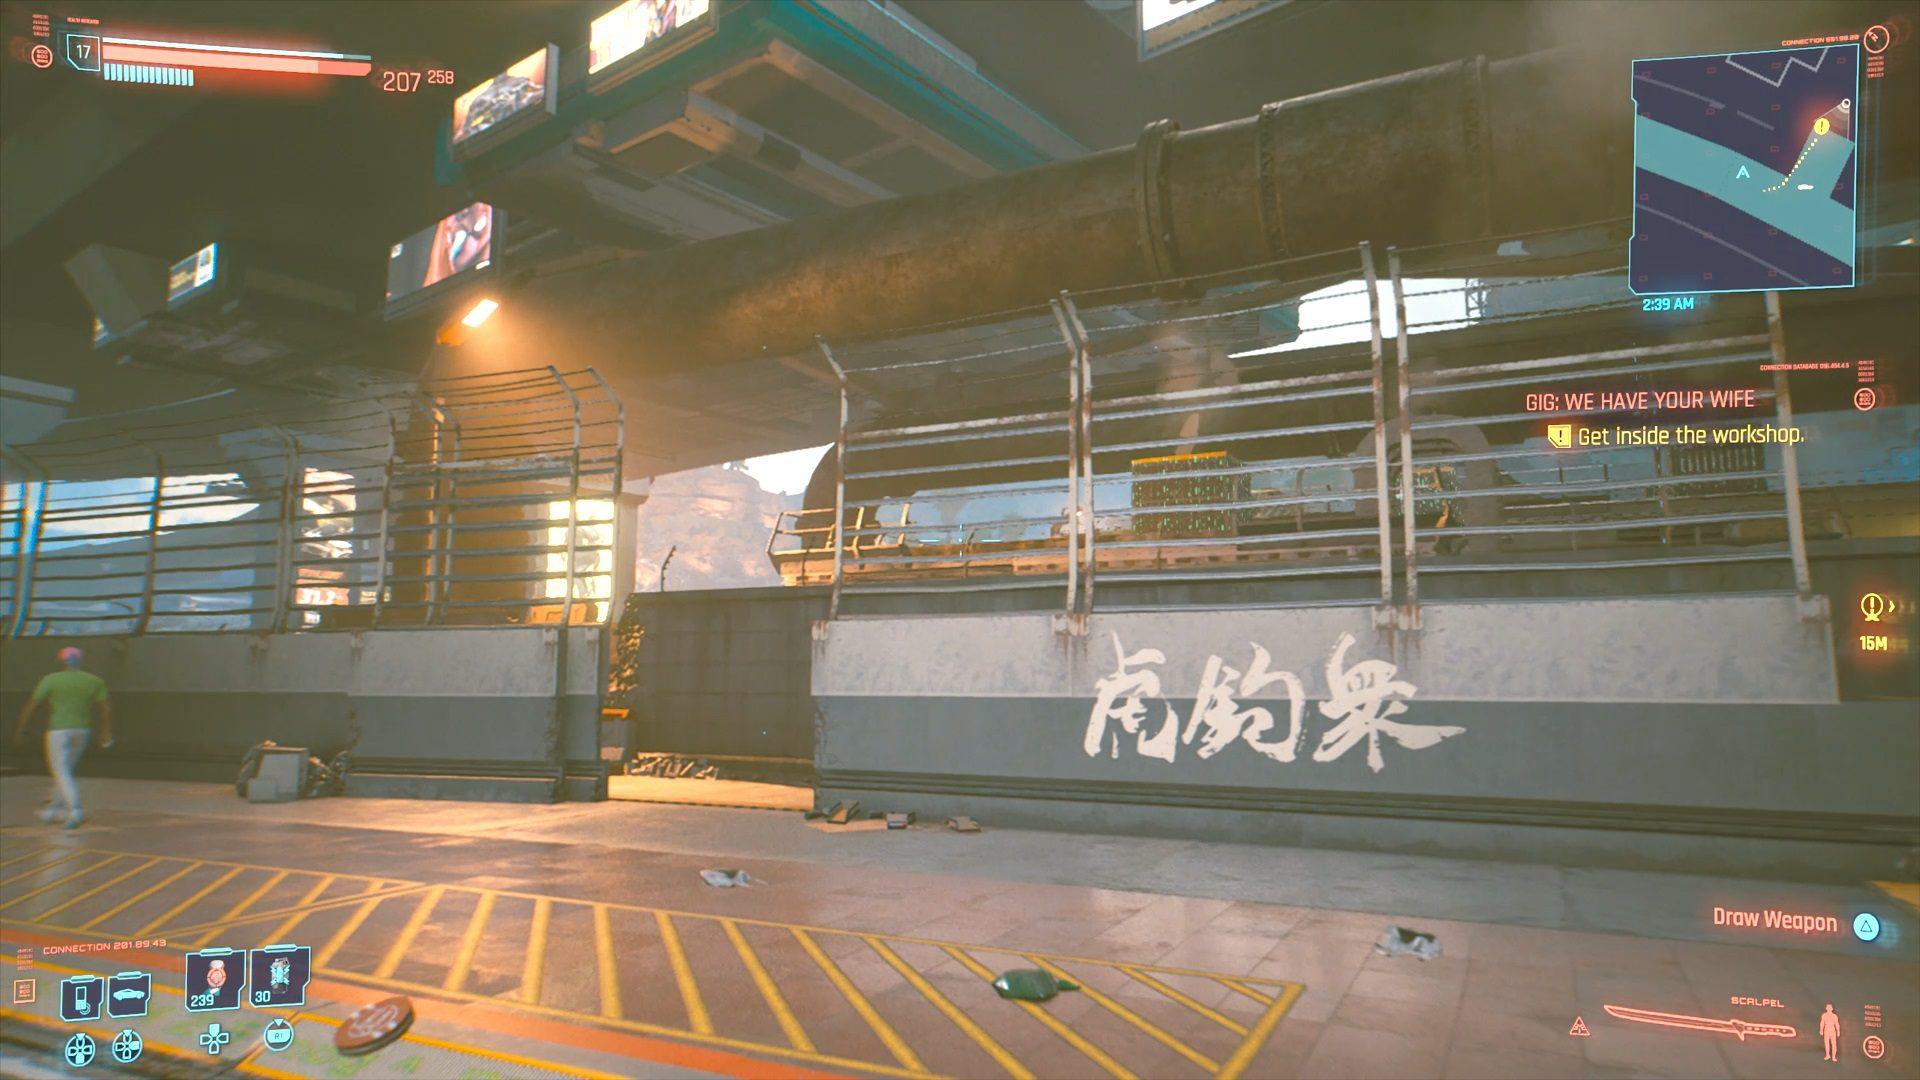 Cyberpunk 2077 Raymond St Warehouse